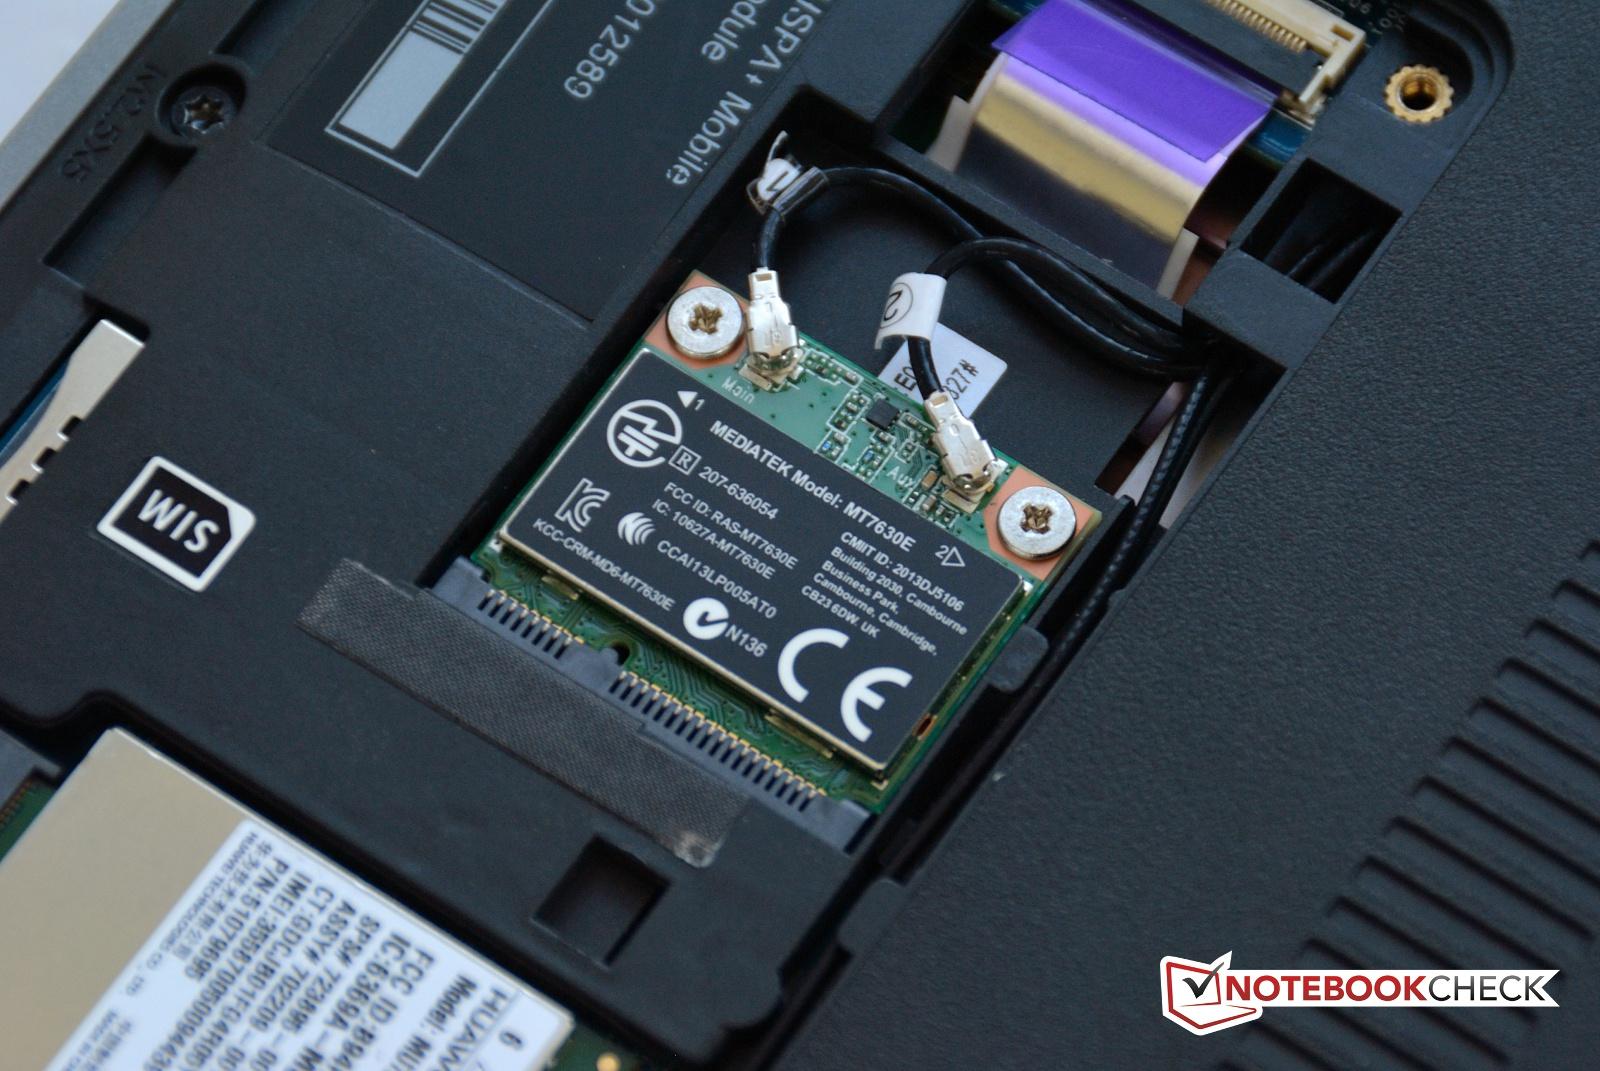 Download Hp probook 450 g1 lan driver